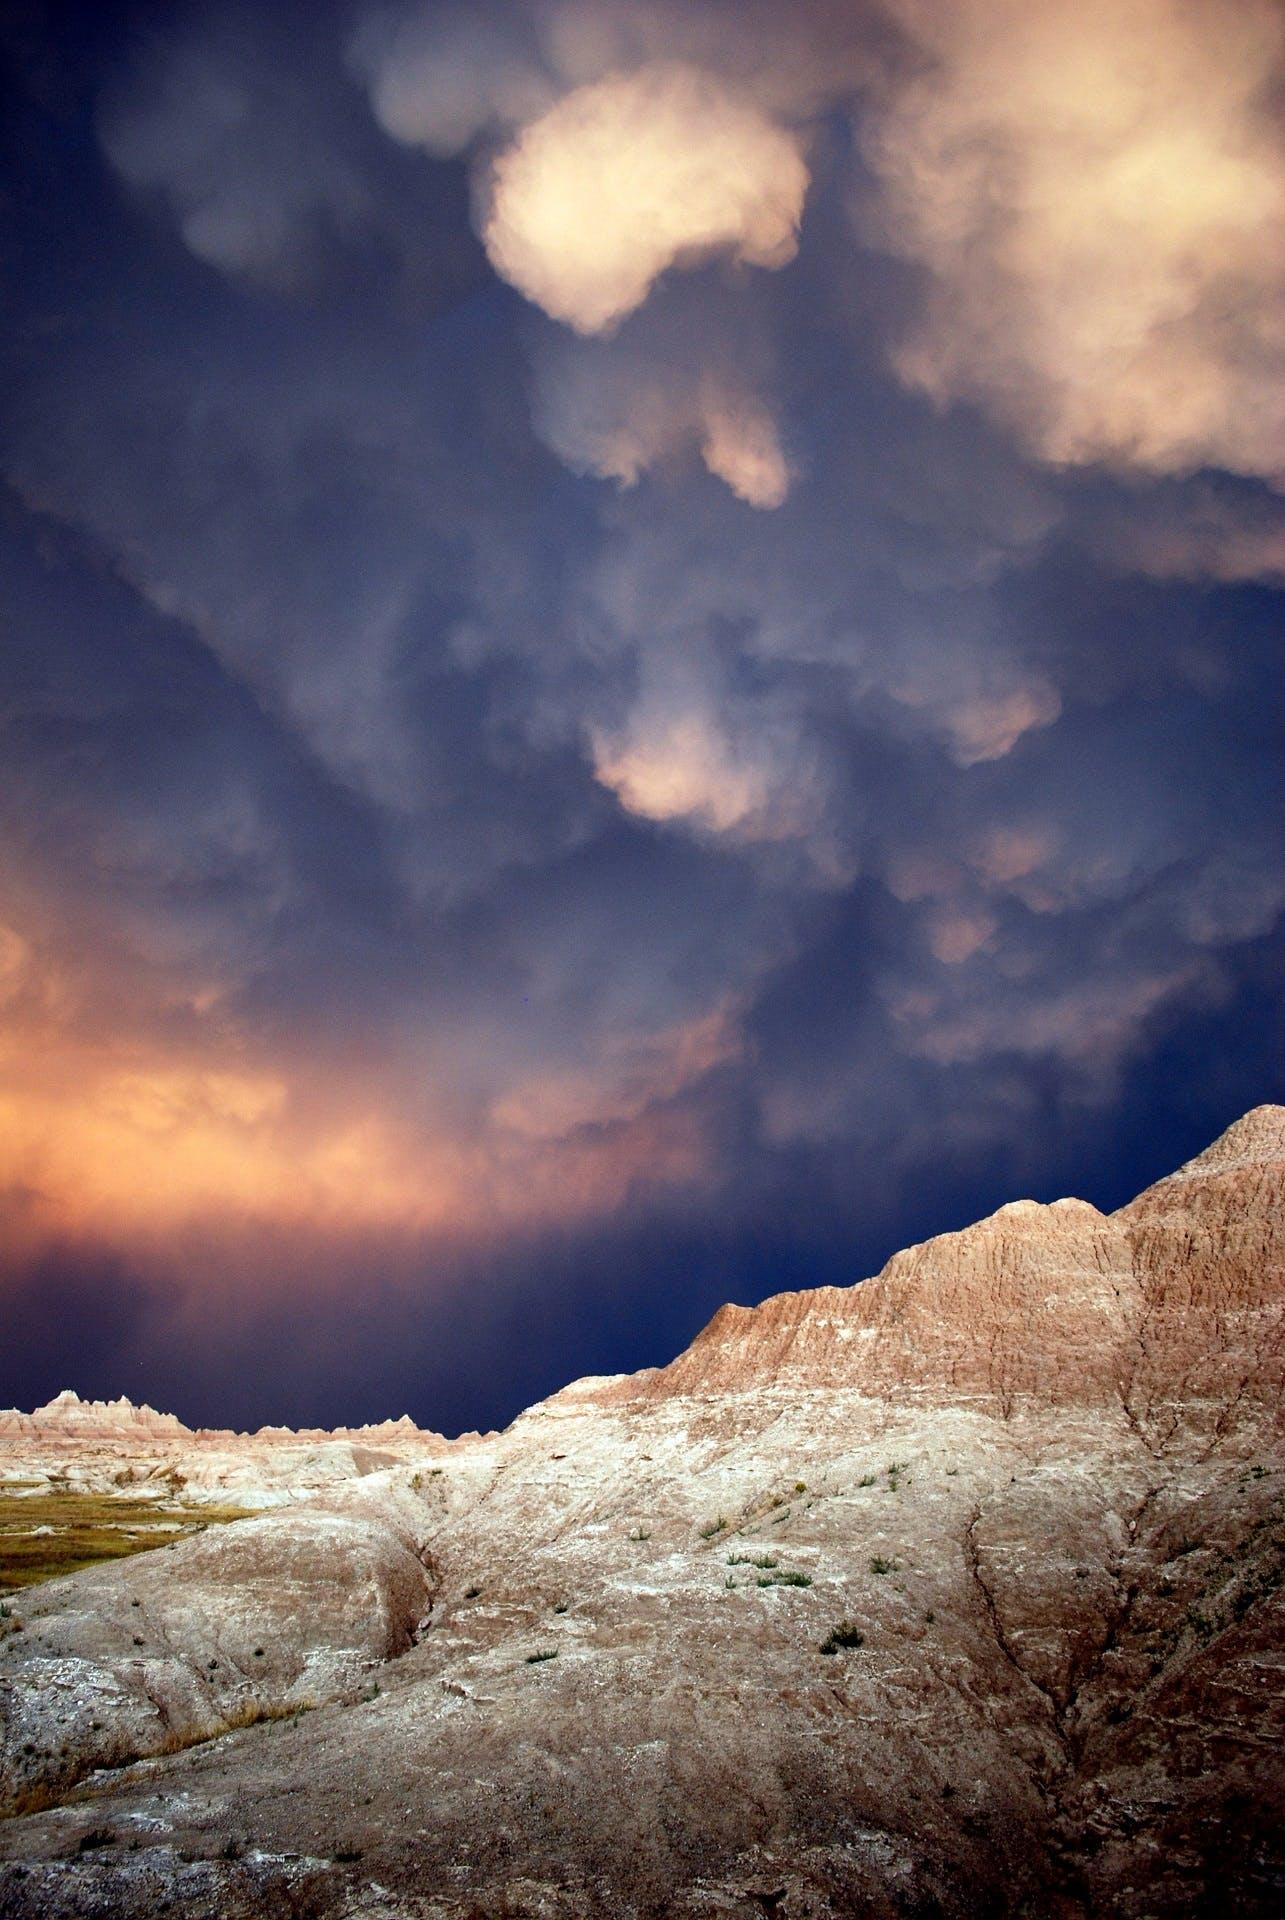 badlands national park, cloud, cloudburst